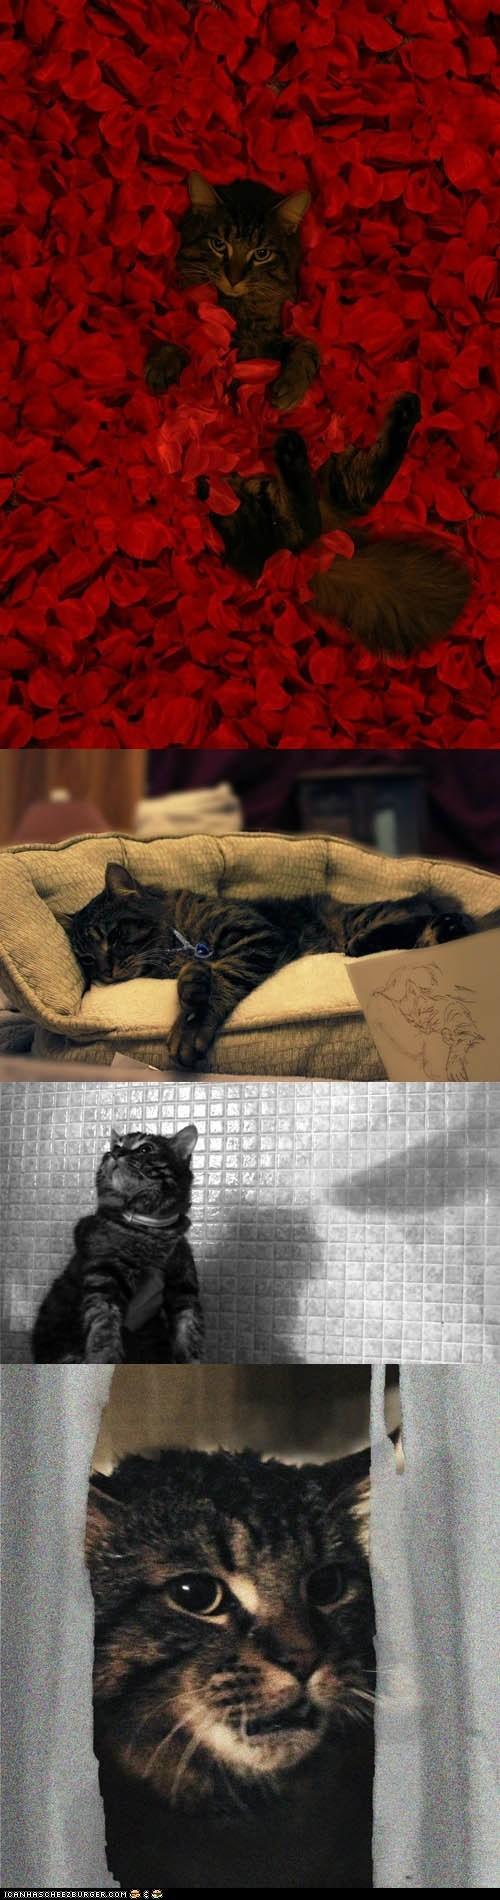 Cat Reenacts Iconic Film Scenes